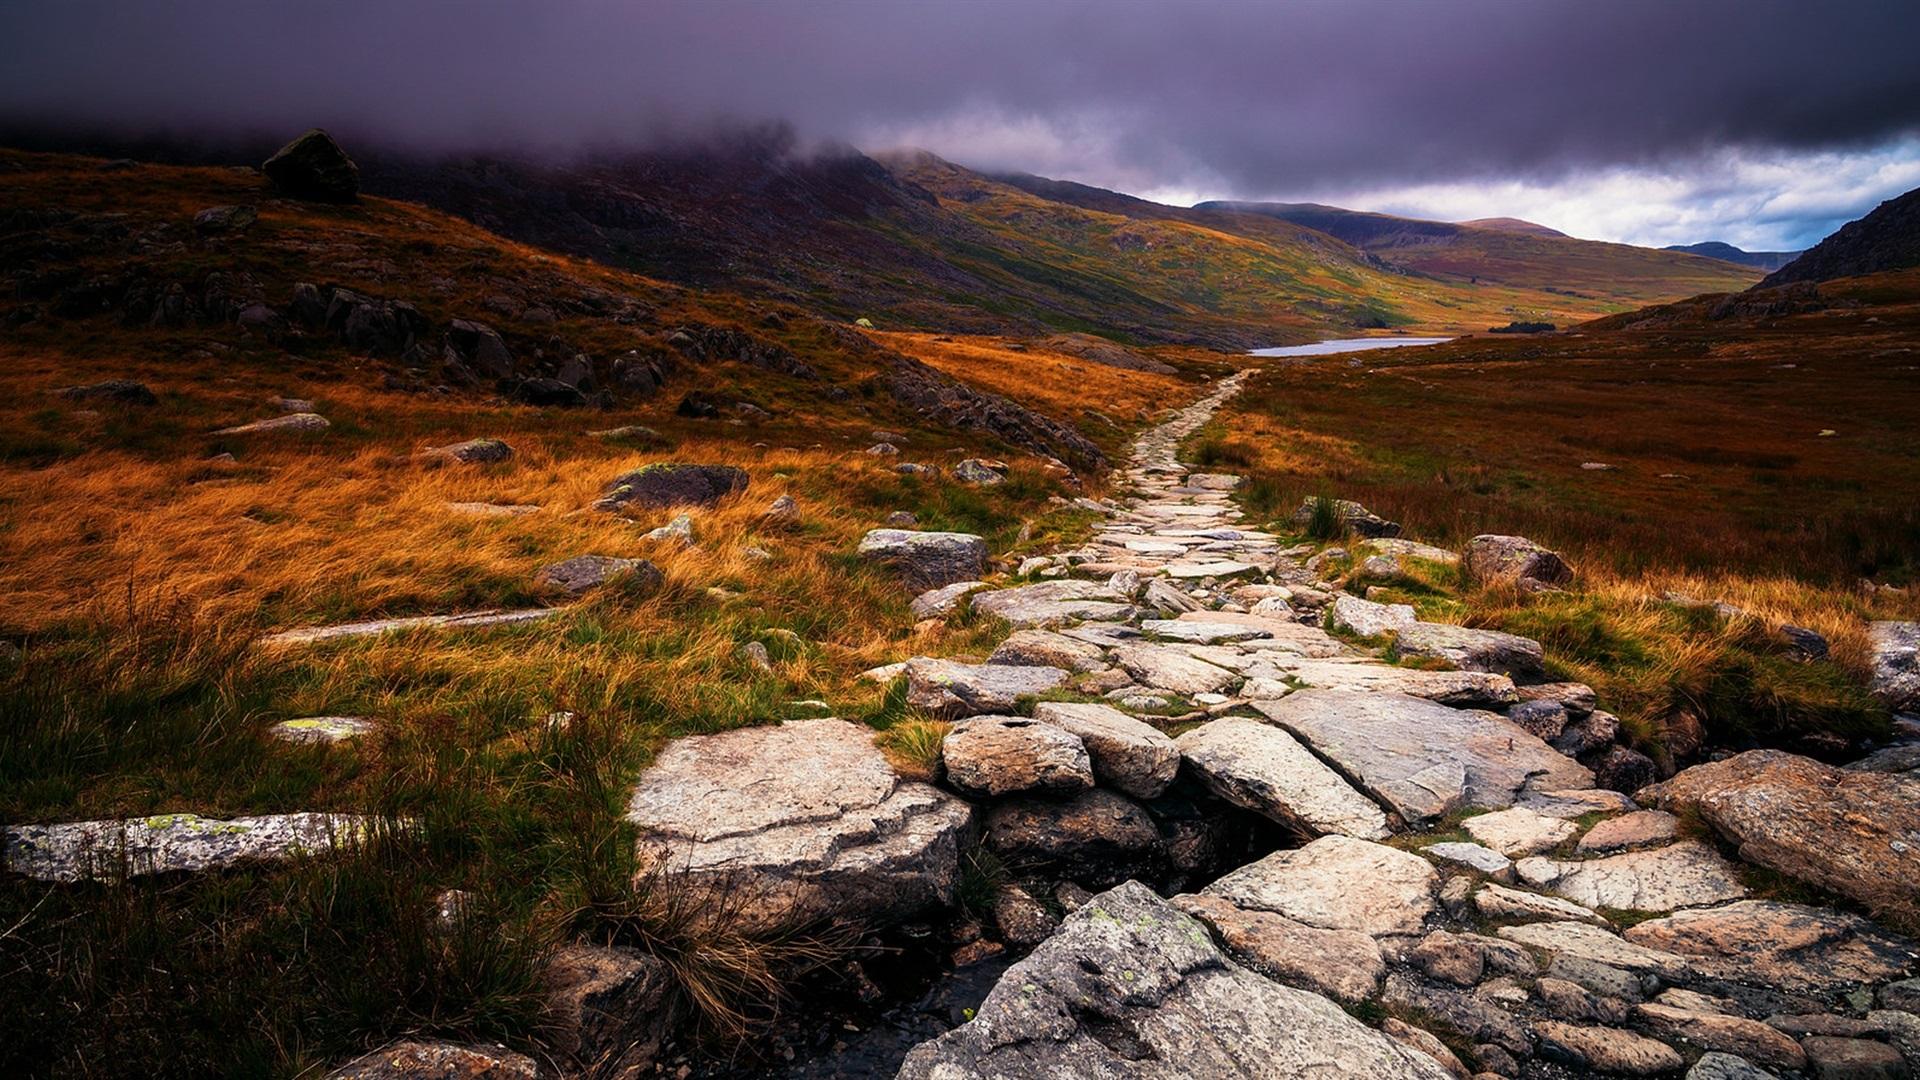 stone path wallpaper - photo #4